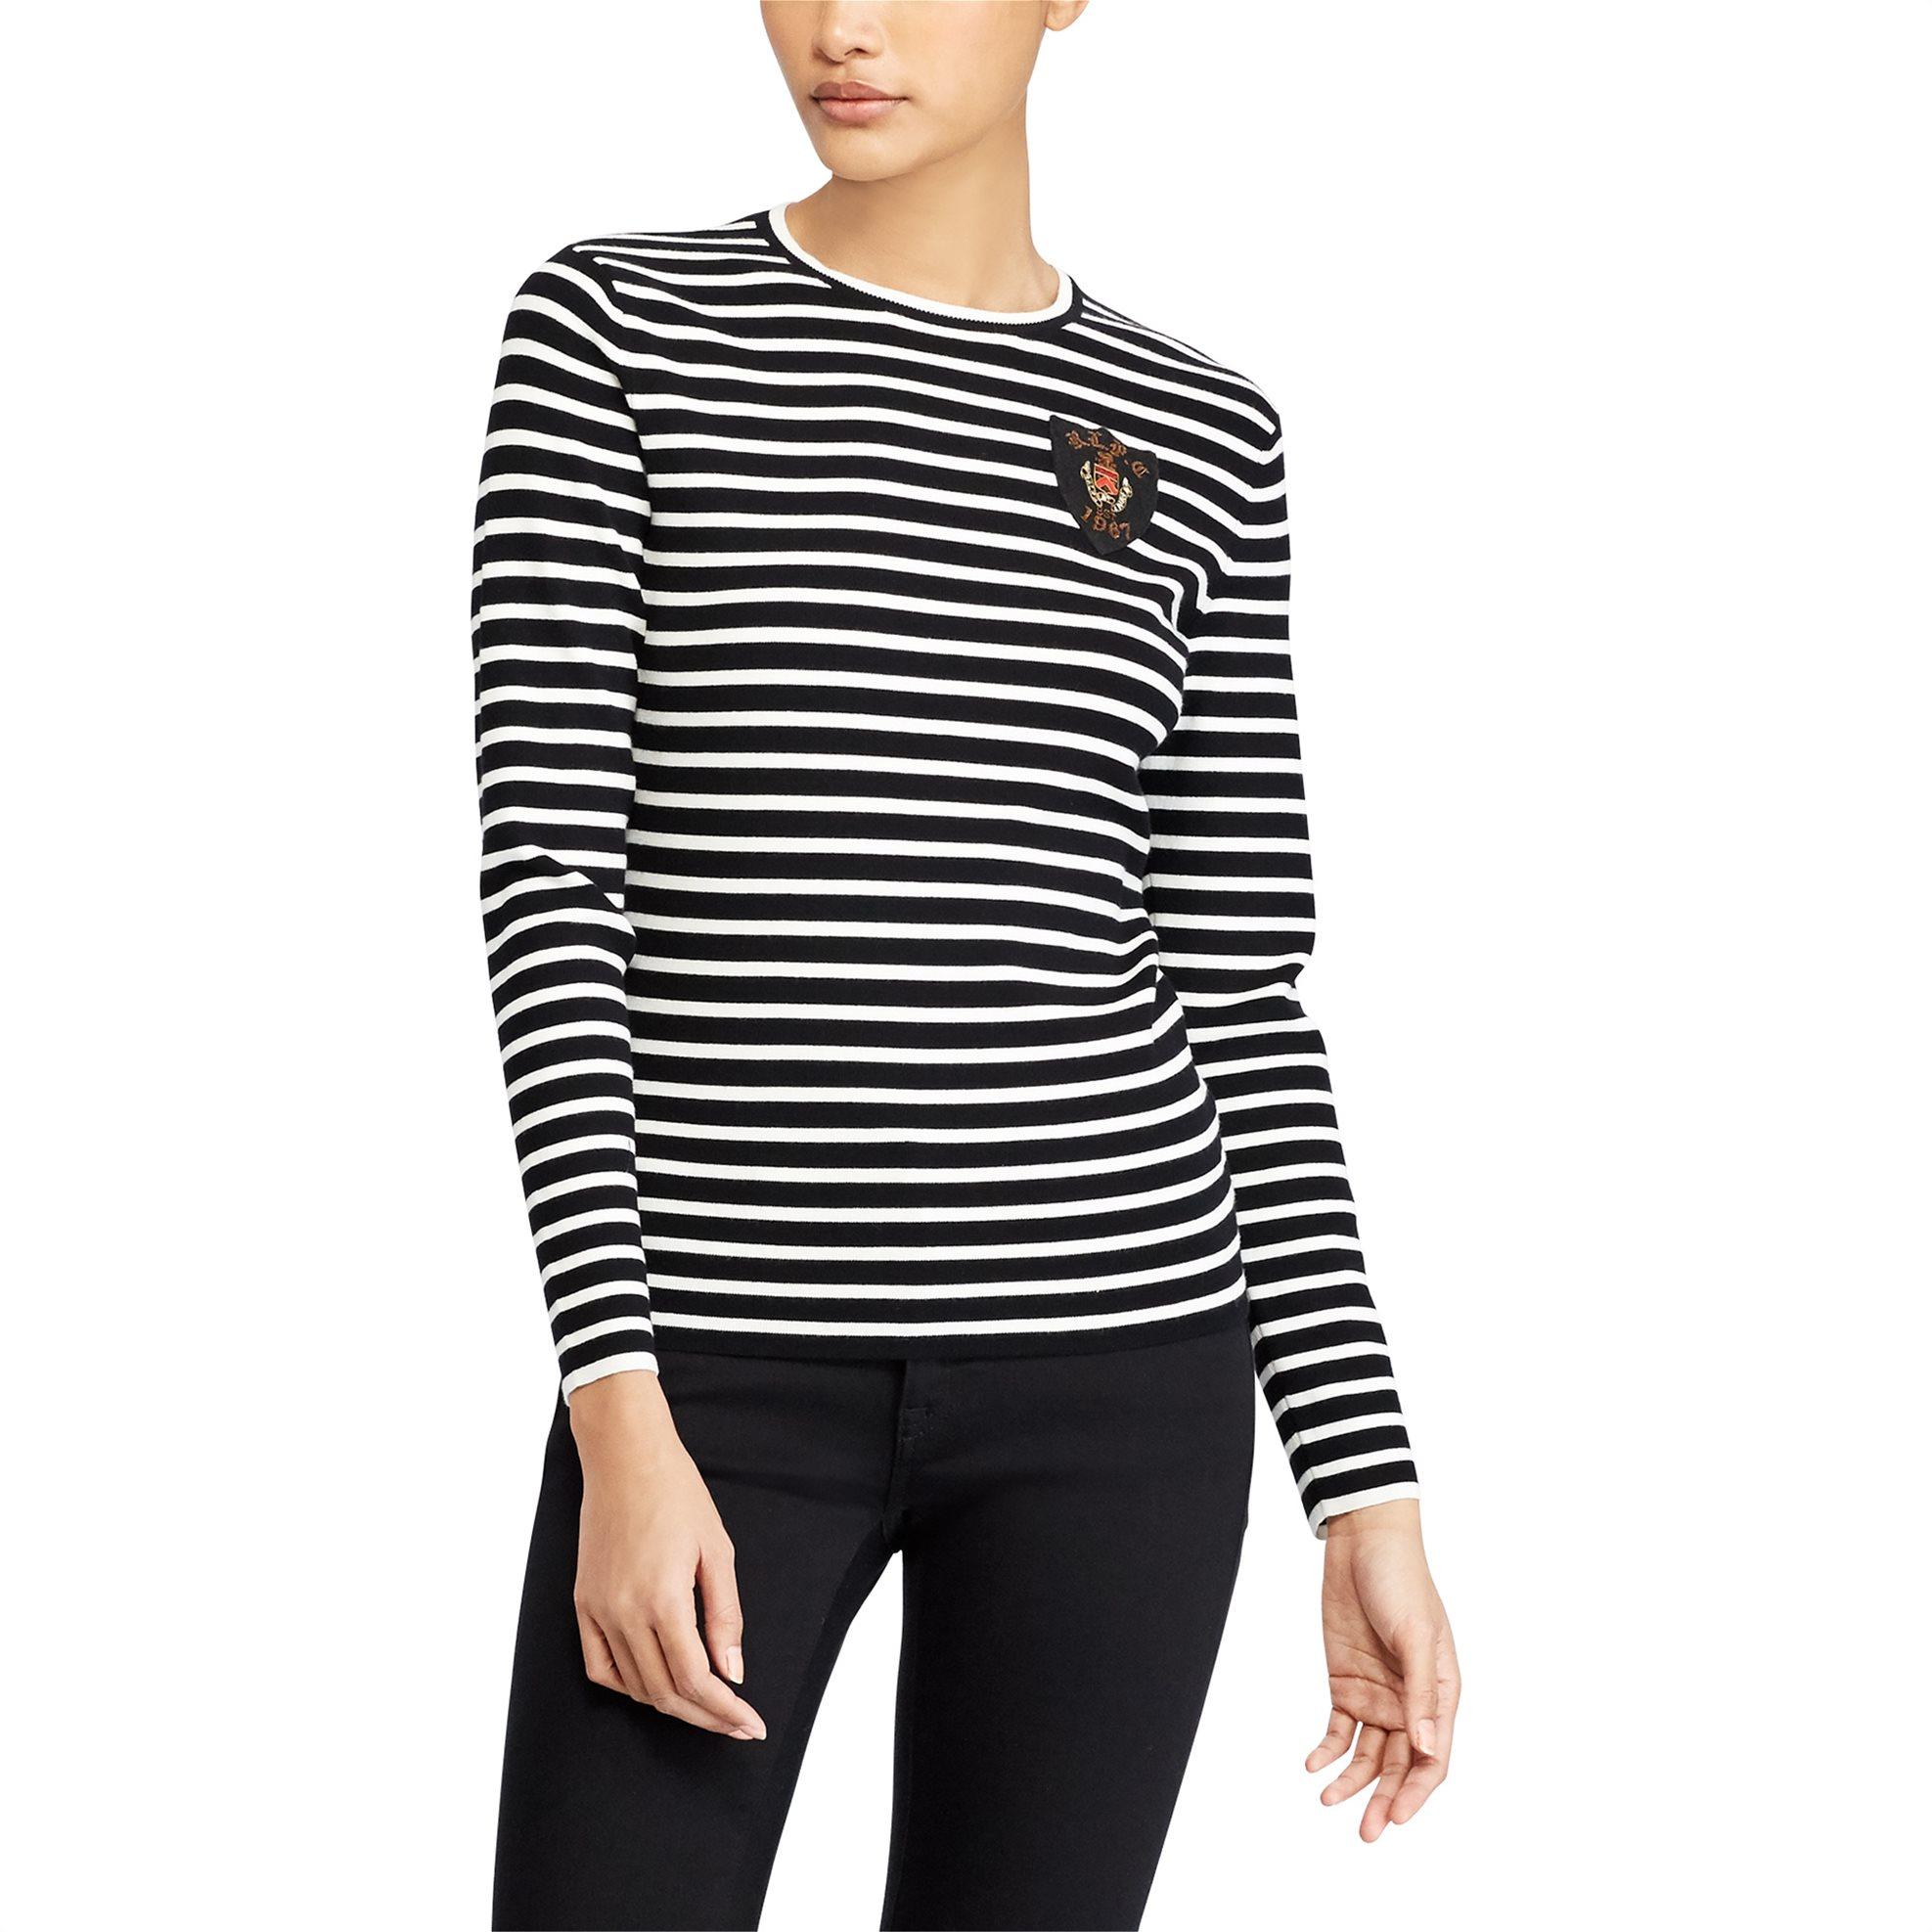 Polo Ralph Lauren γυναικεία ριγέ μπλούζα Bullion-Patch Striped Top - 21170625100 γυναικα   ρουχα   tops   μπλούζες   casual